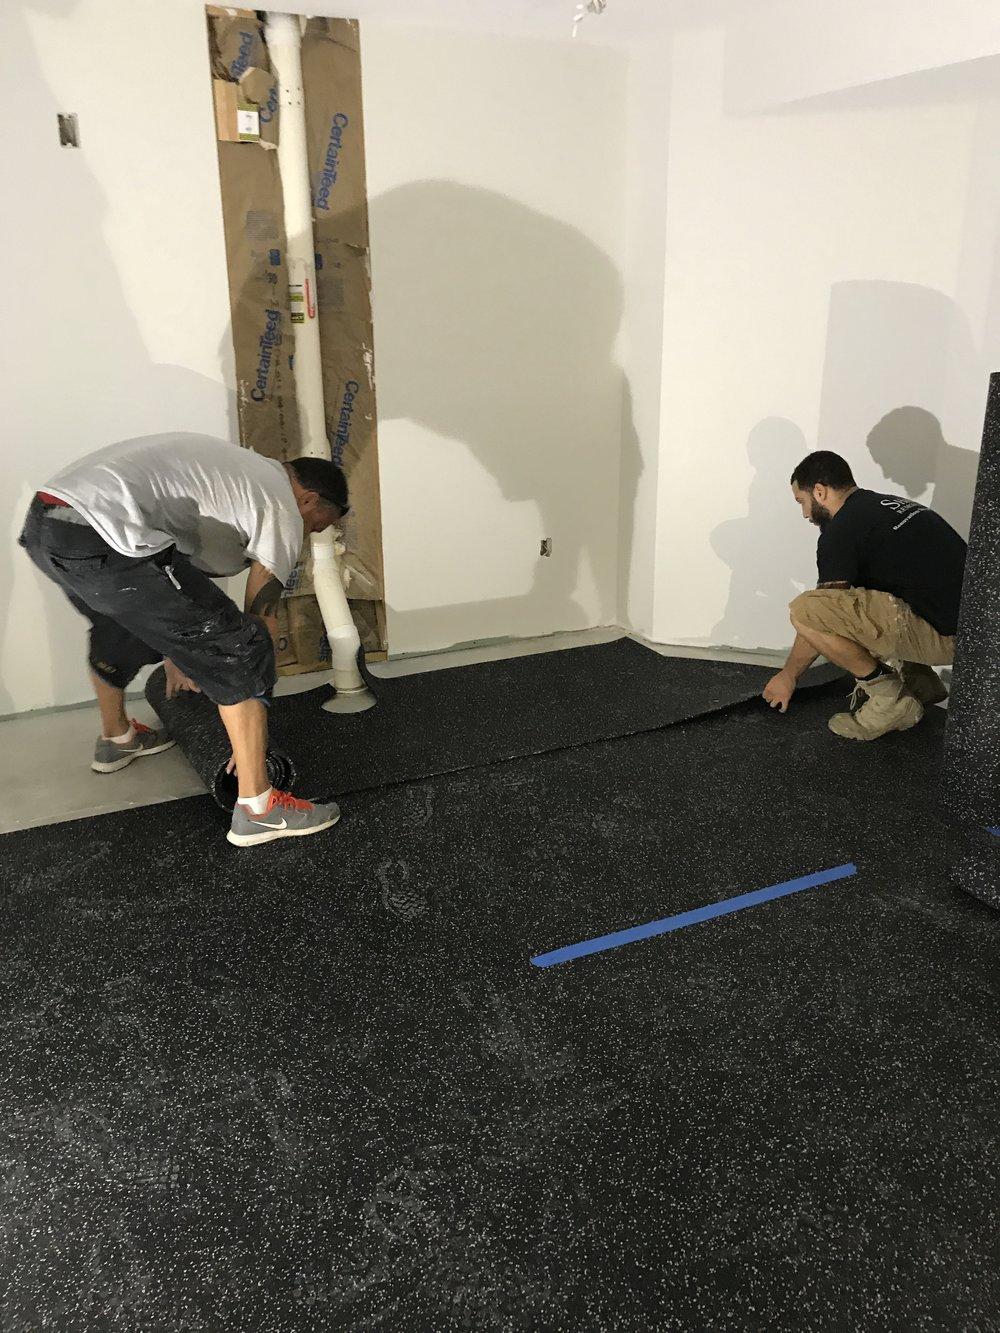 Shaw Remodeling - Progress photo - install flooring in basement finish gym area (2).JPG